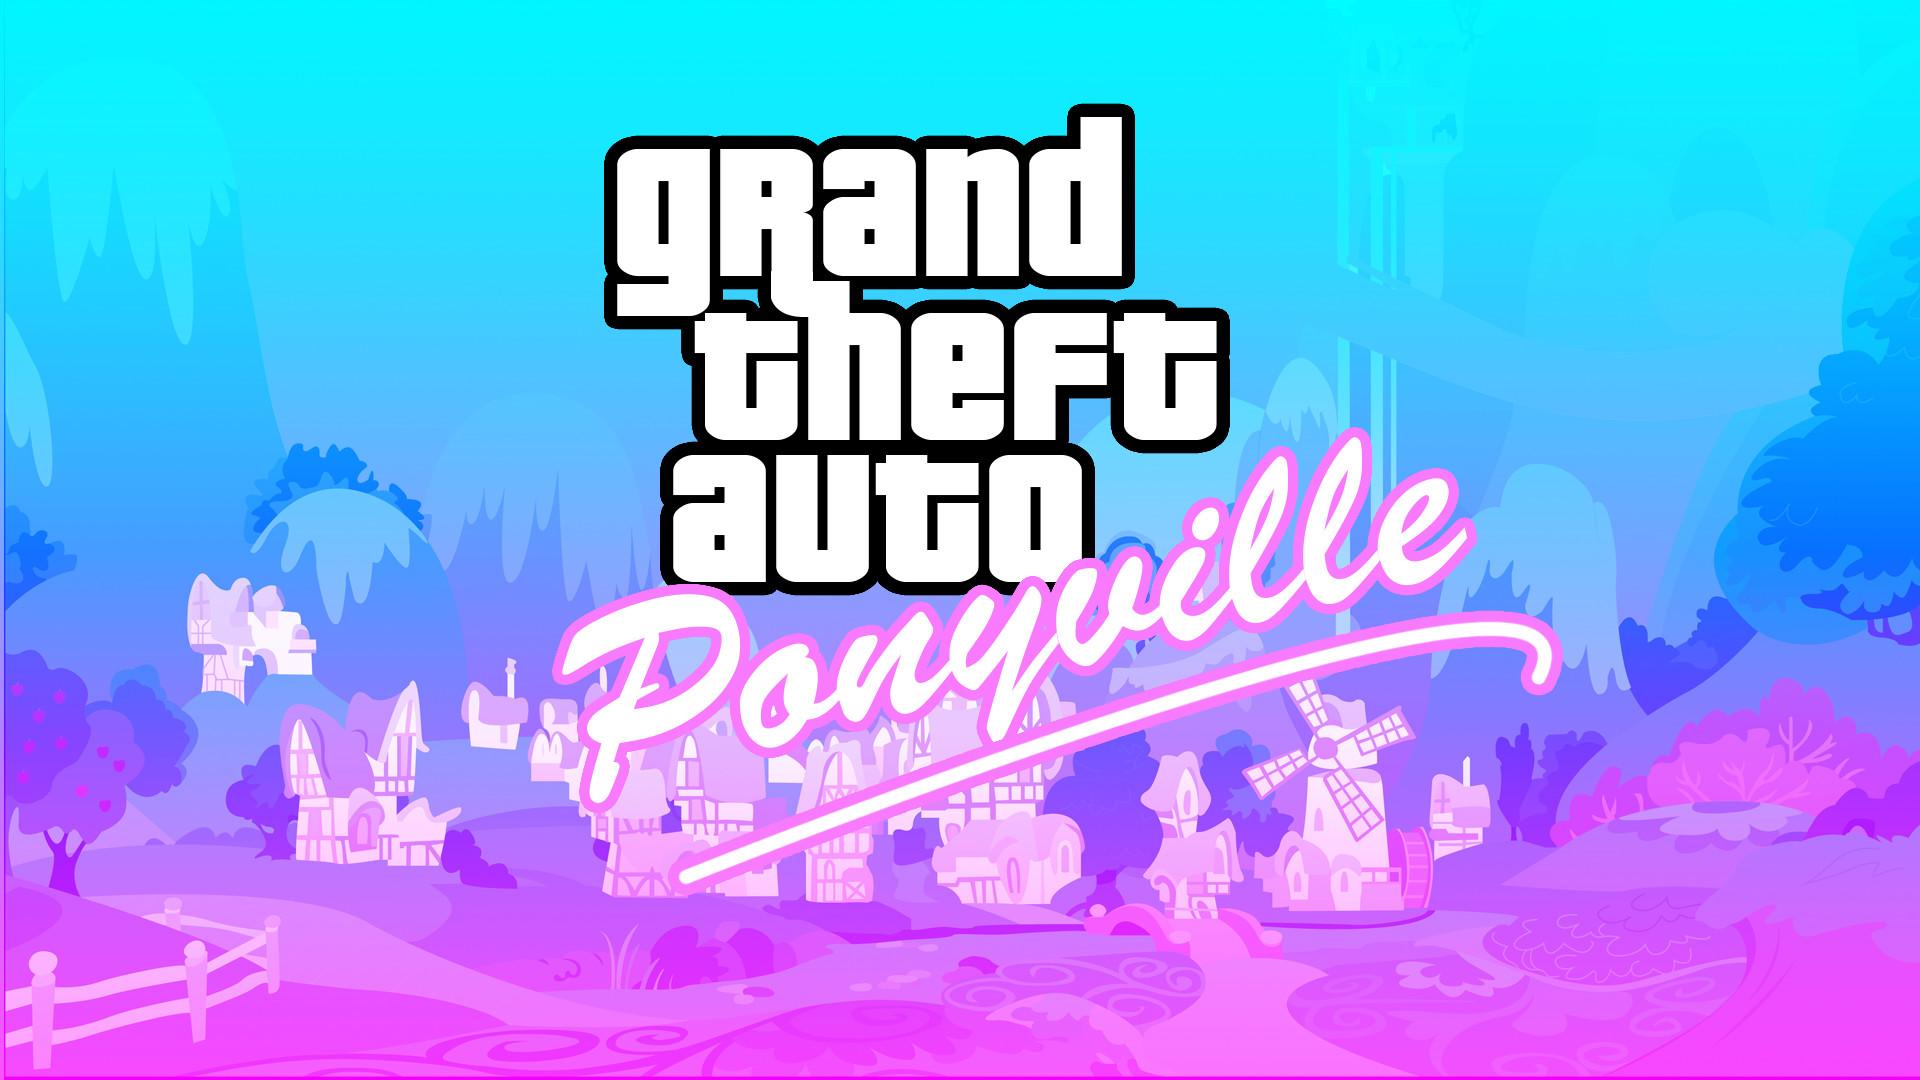 Grand Theft Auto GTA My Little Pony g wallpaper     112758    WallpaperUP